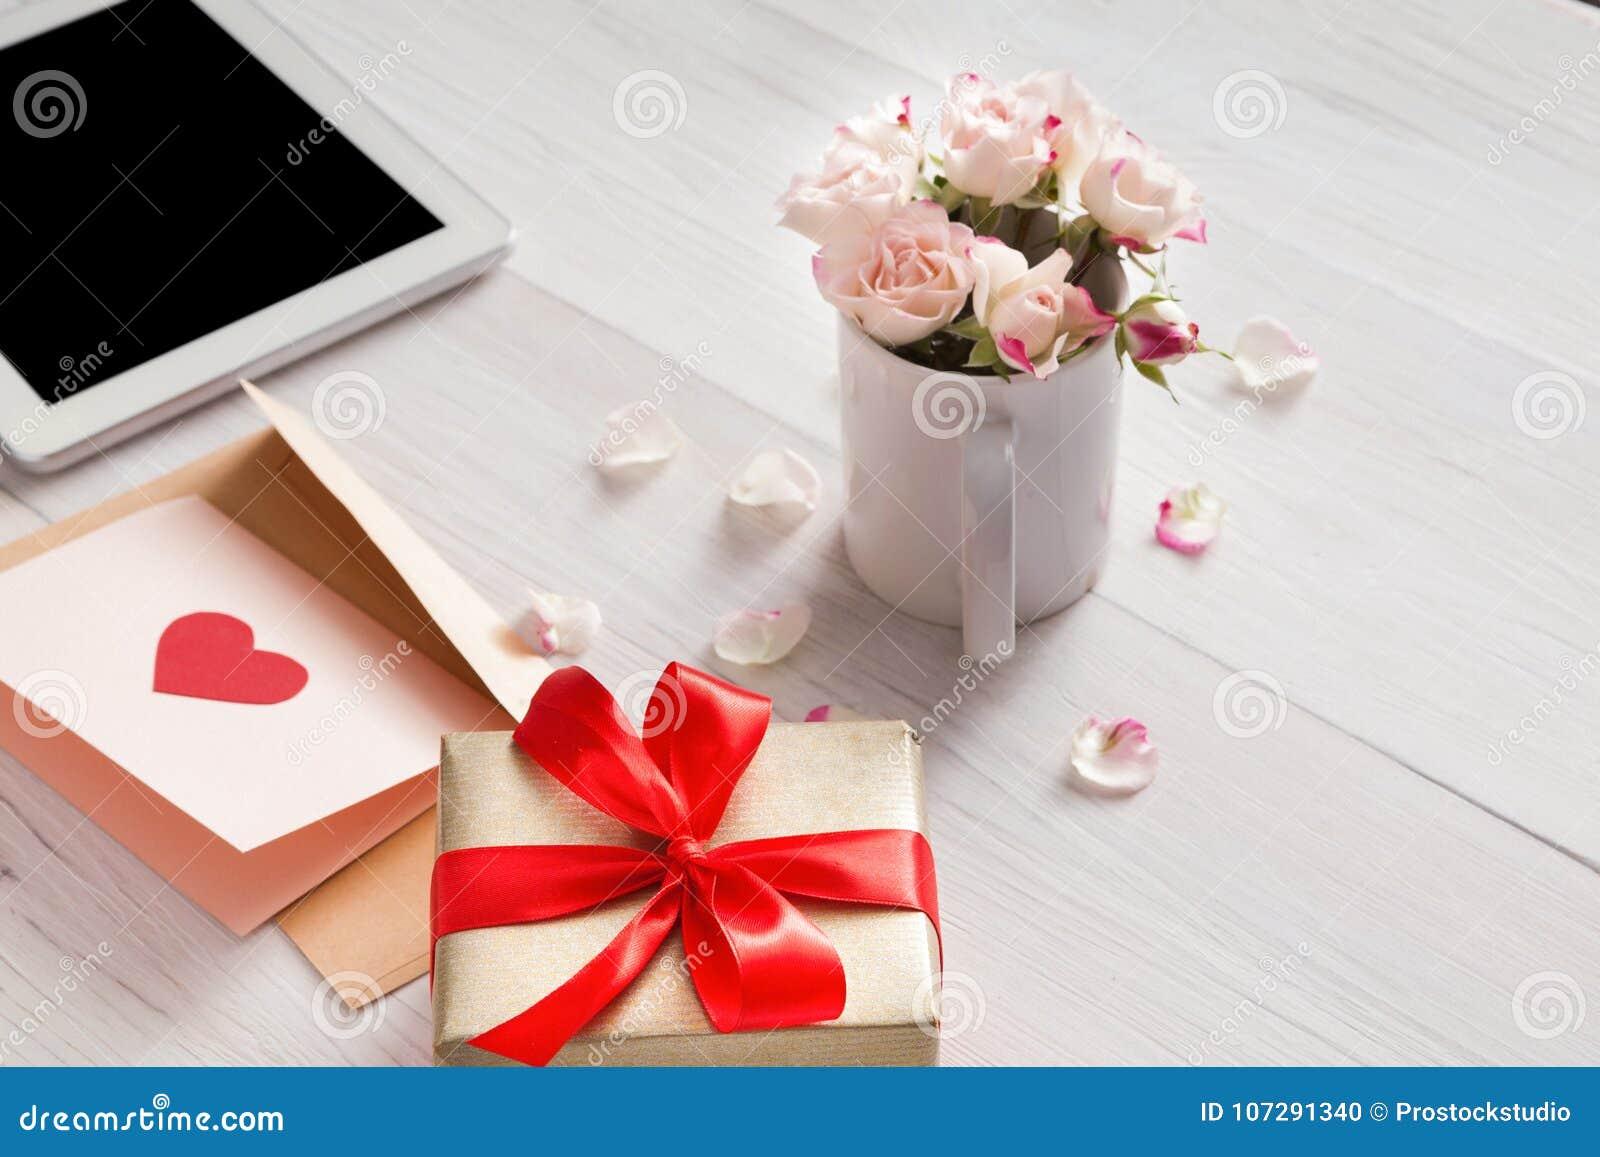 valentine day online shopping background stock photo image of